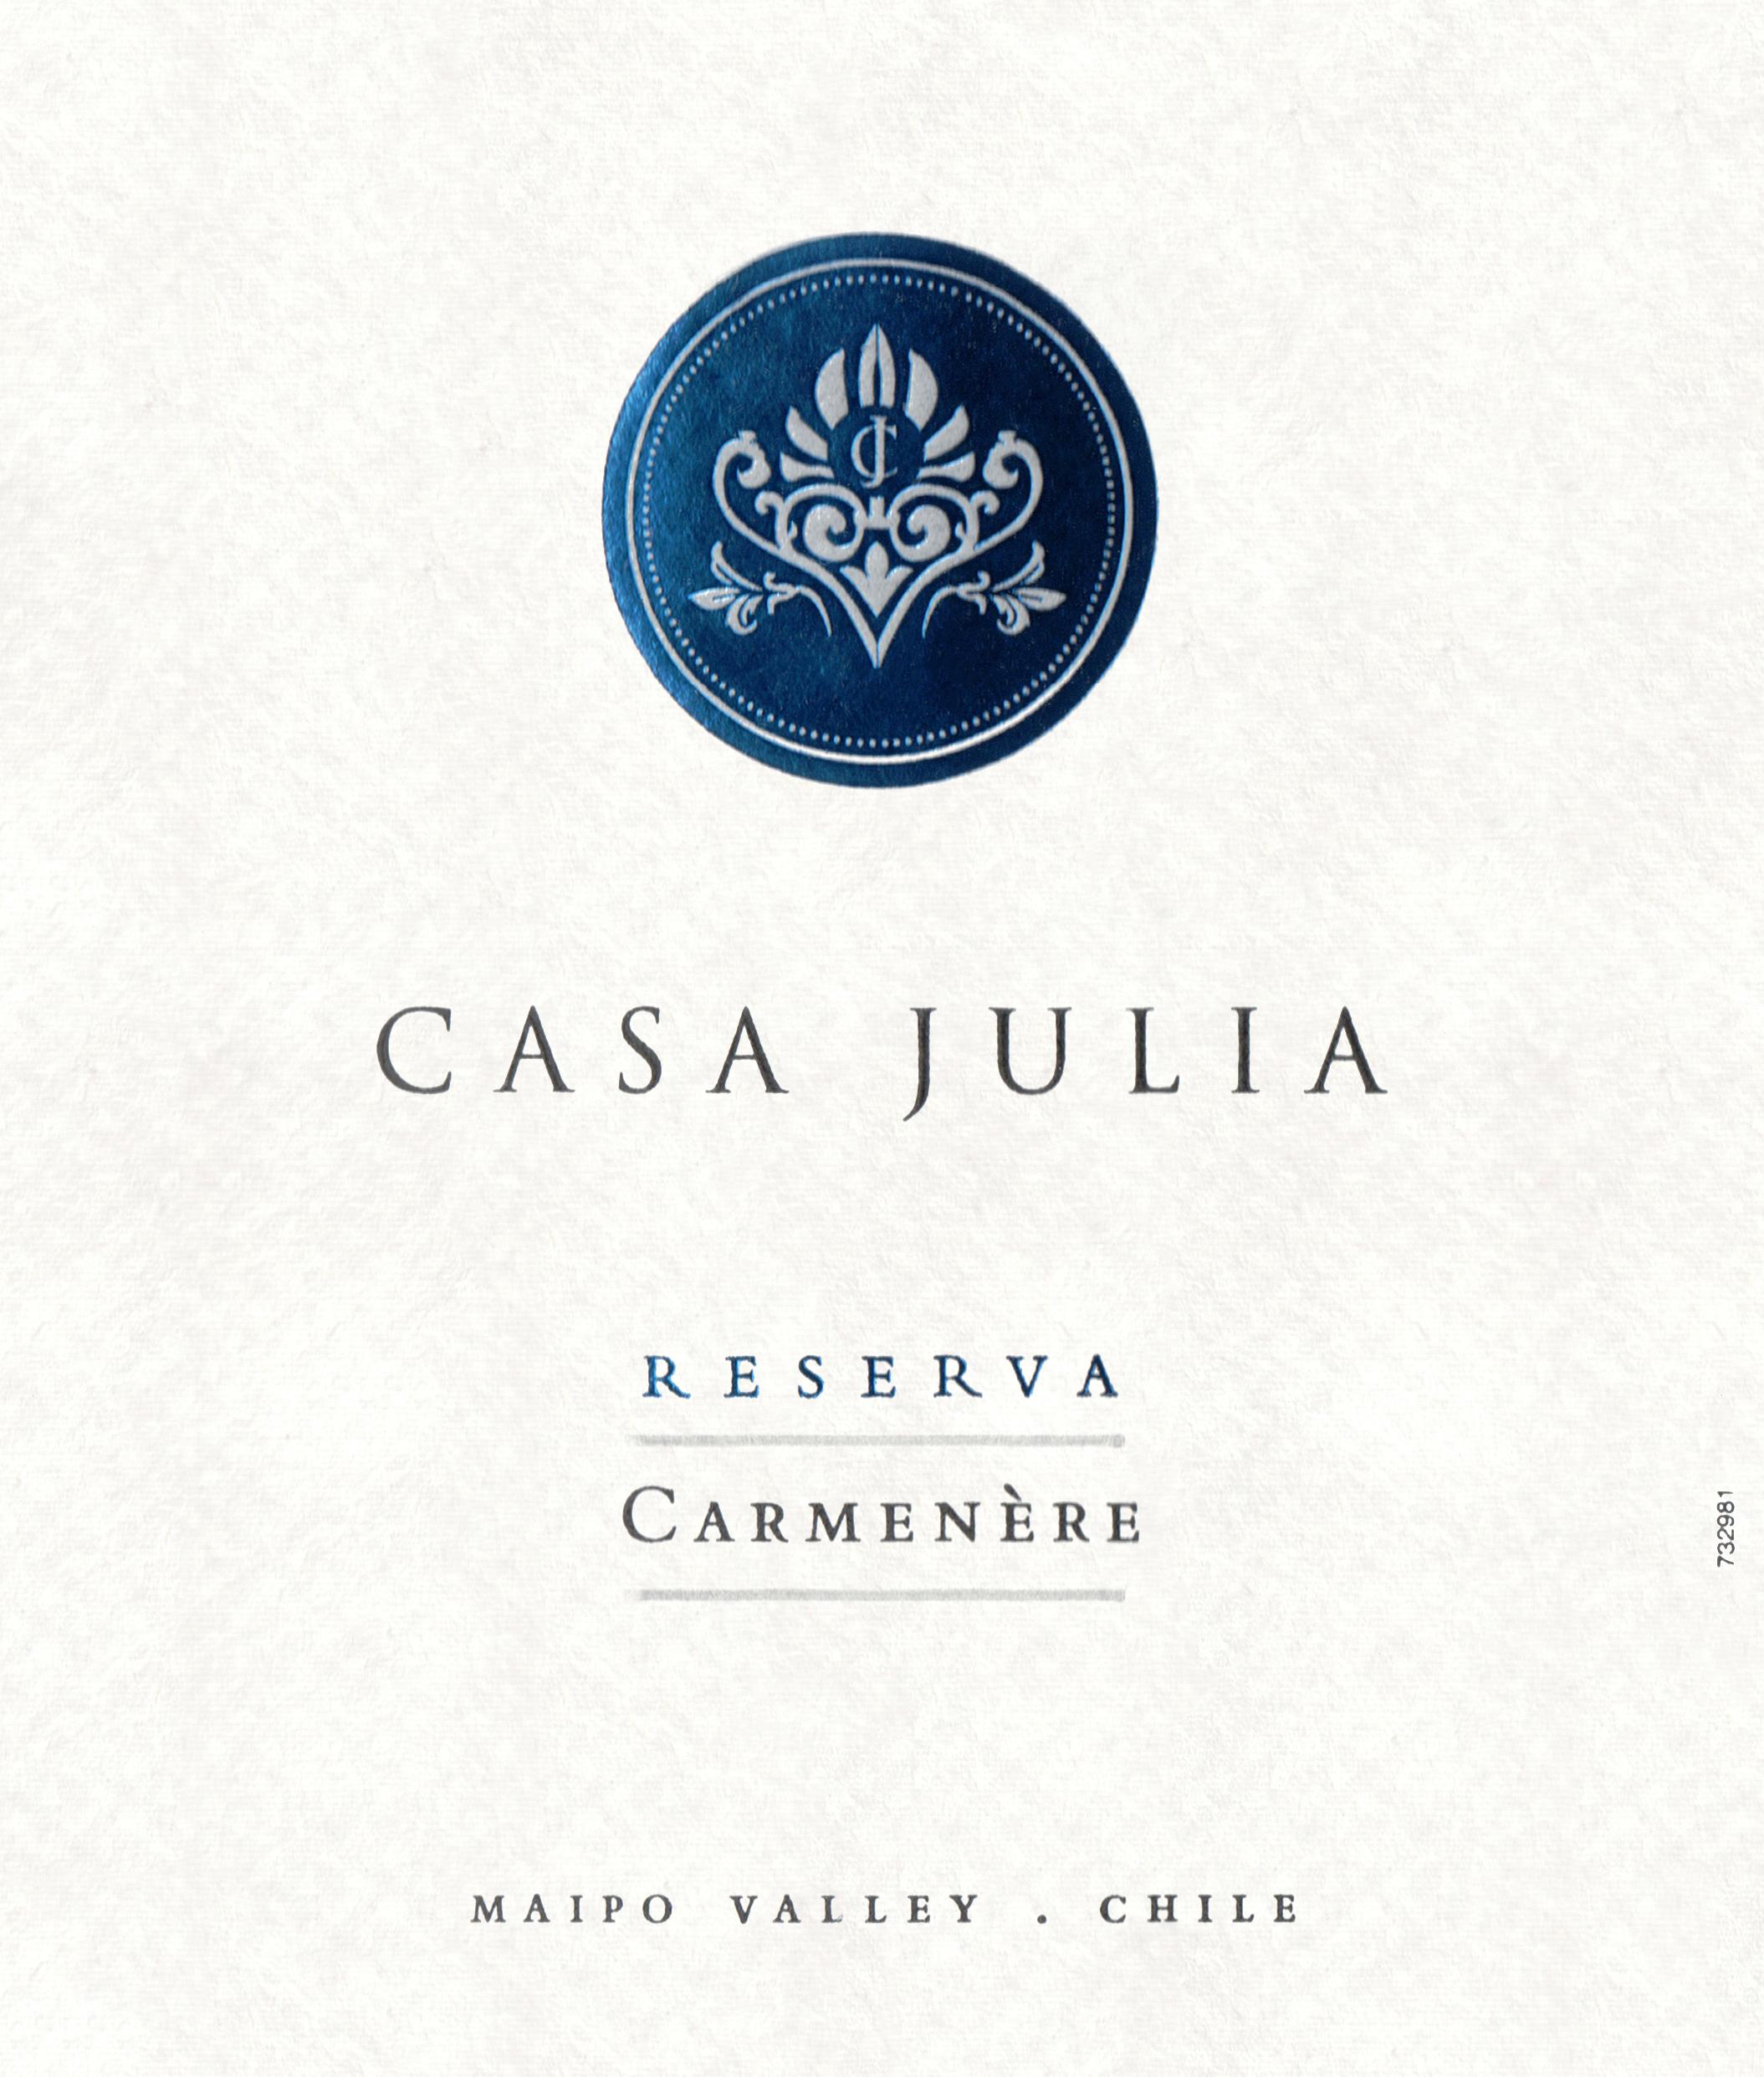 Casa Julia Reserve Carmenere 2018